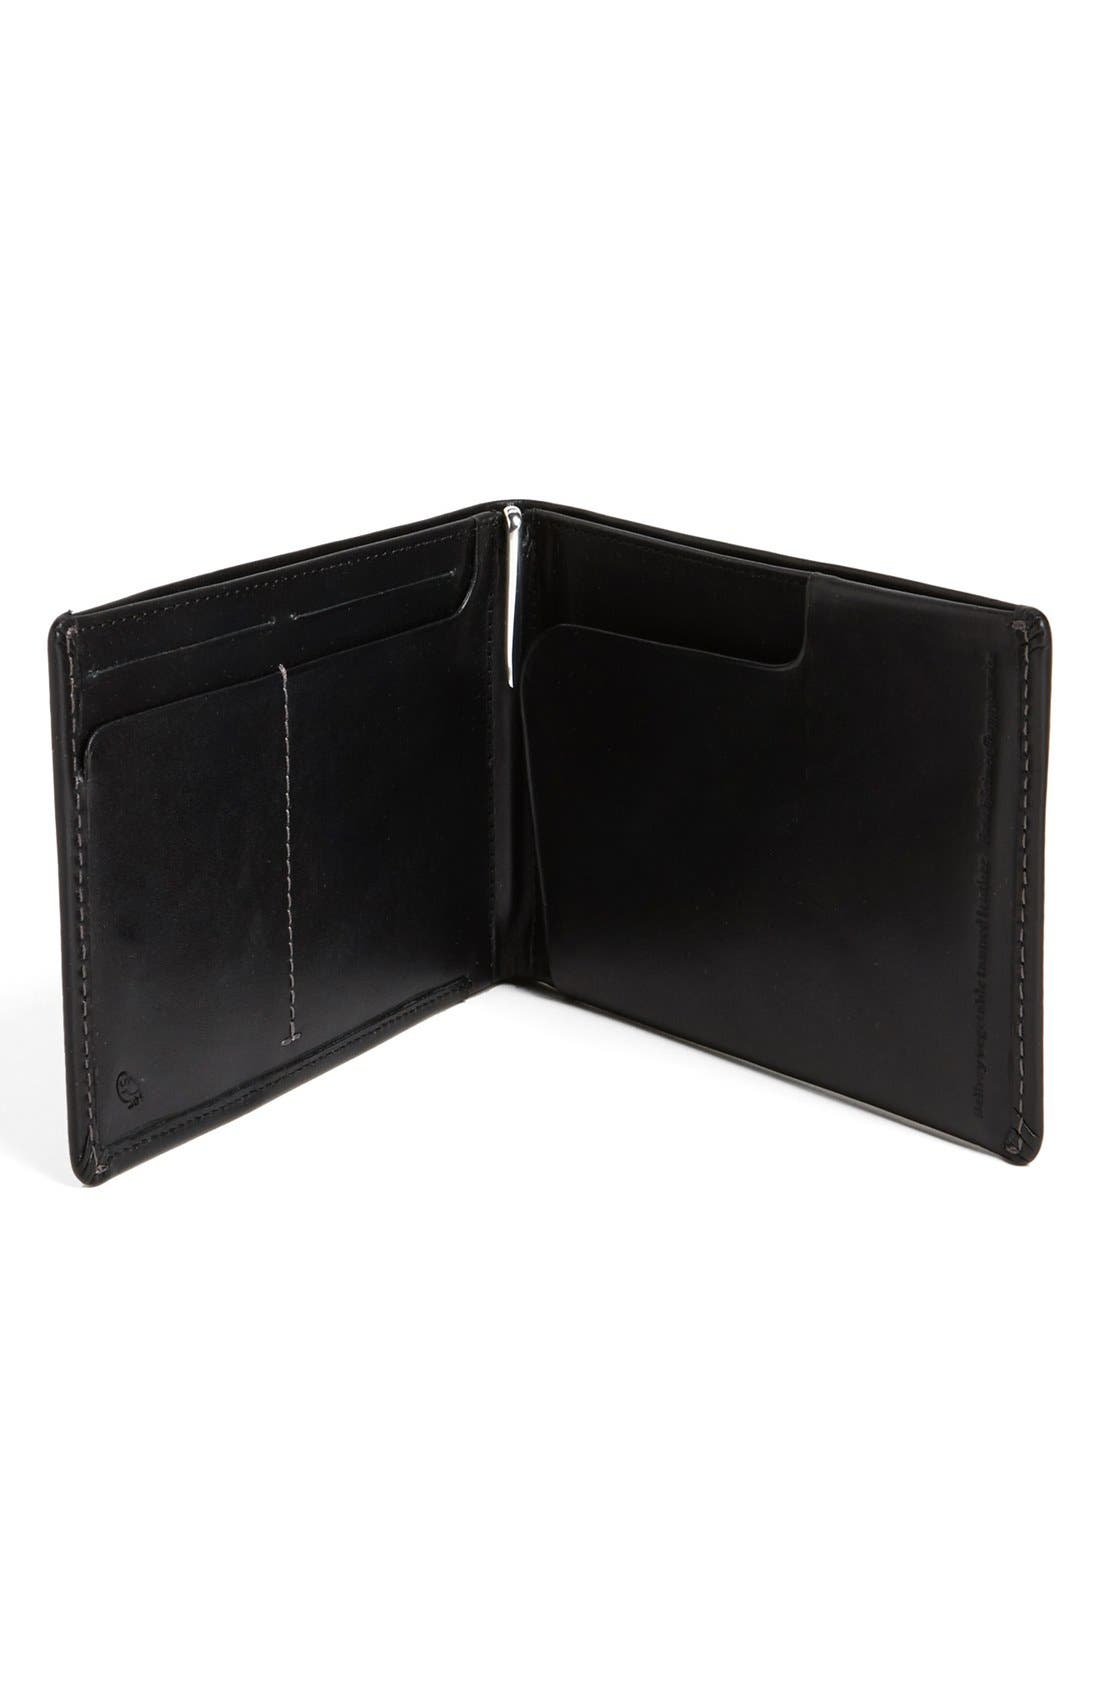 BELLROY,                             Travel Wallet,                             Alternate thumbnail 2, color,                             001